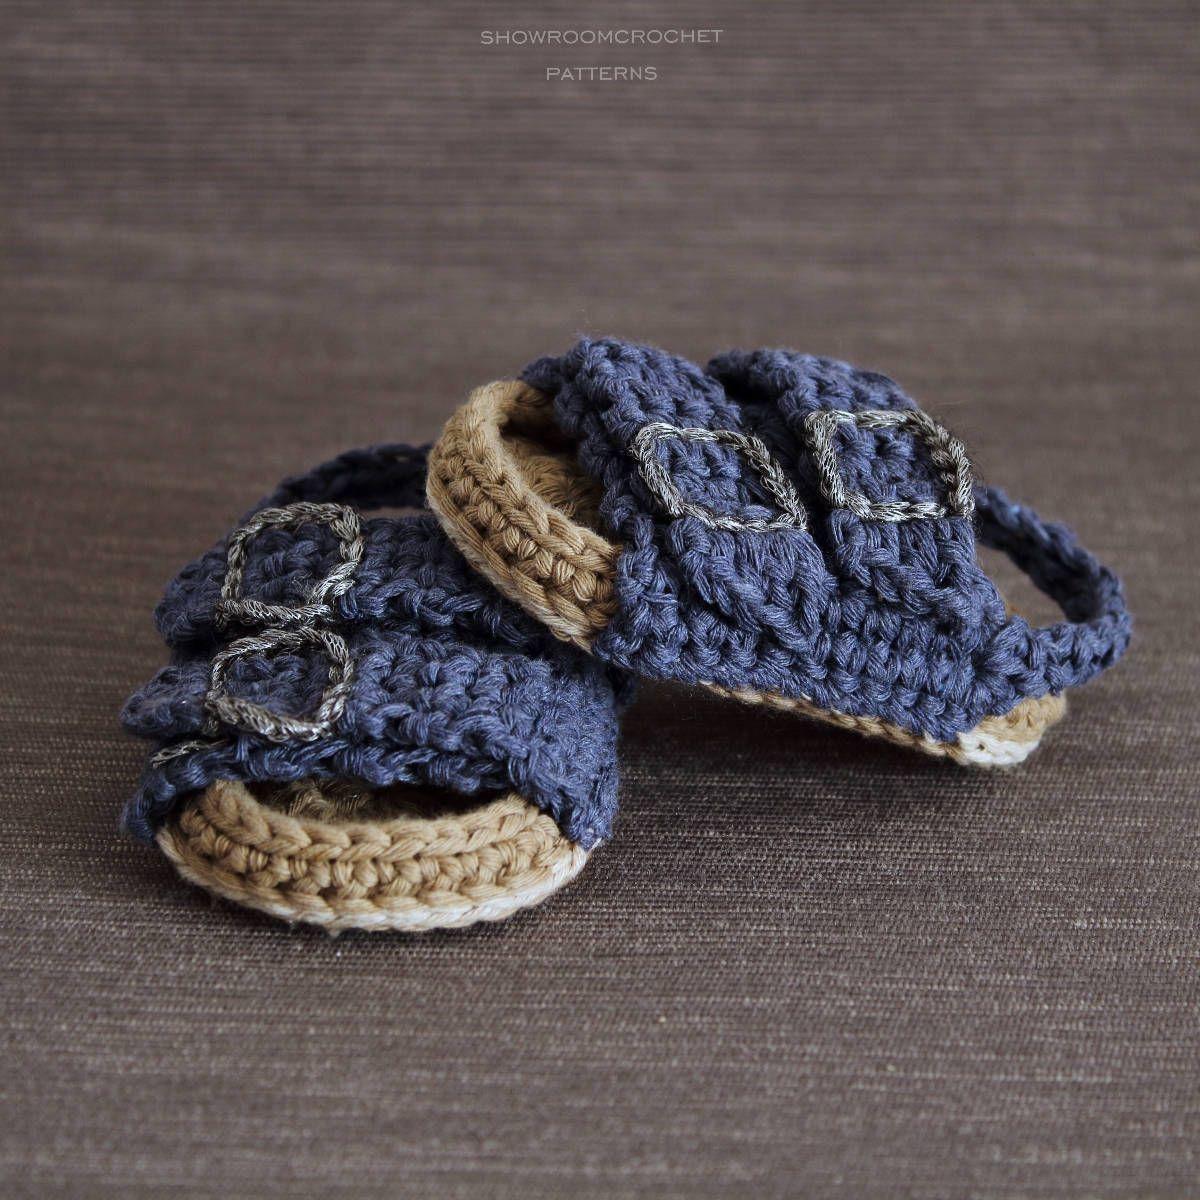 Patron de crochet Sandalias de bebe estilo Birkenstock | Bebes ...